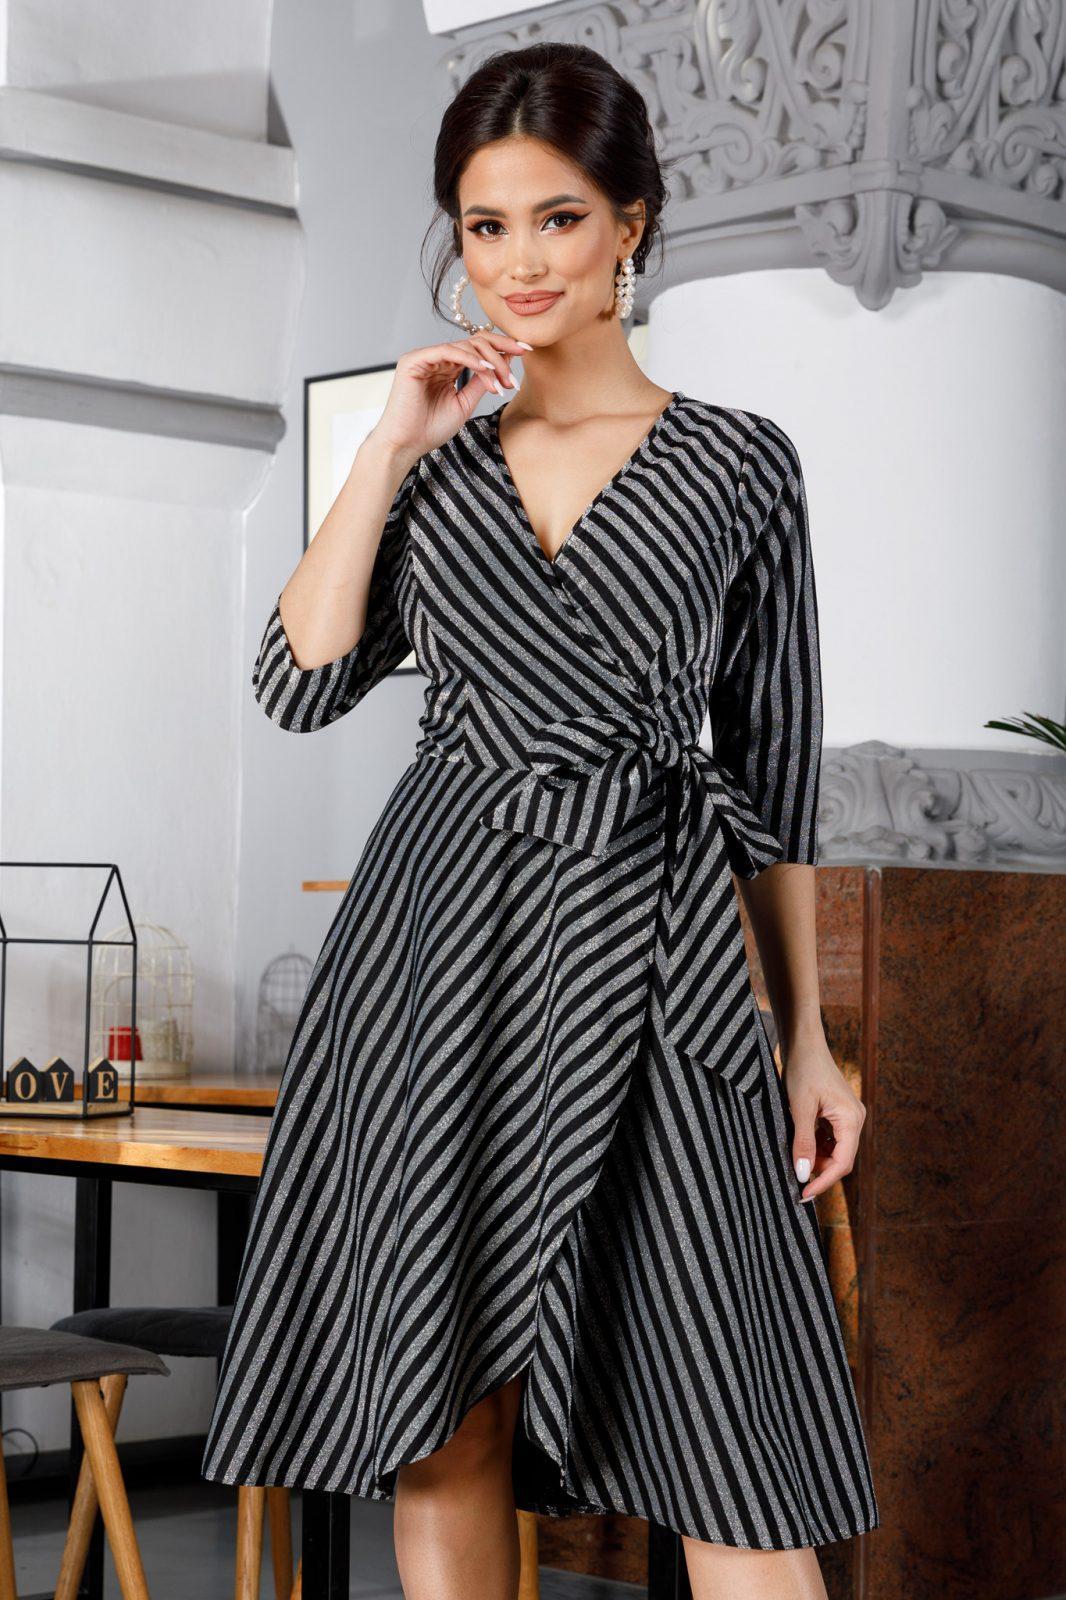 Lizzy Bicolore Dress